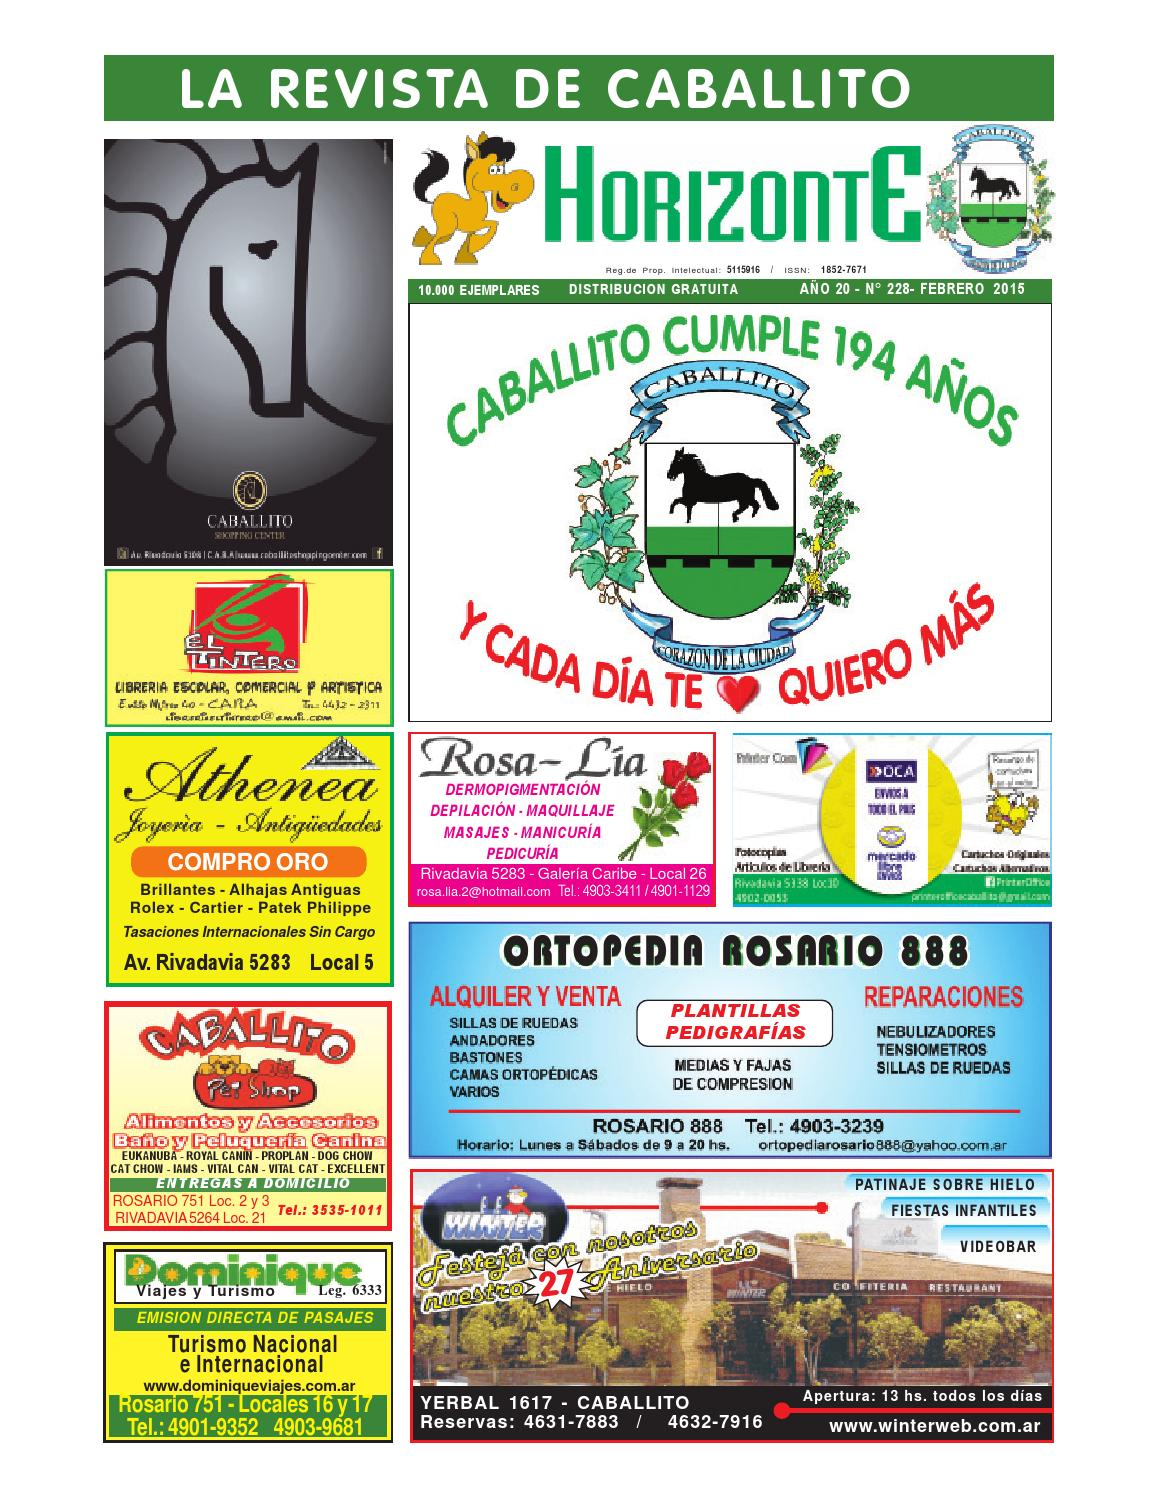 Horizonte 228 febrero año 2015 by Revista Horizonte Caballito - issuu